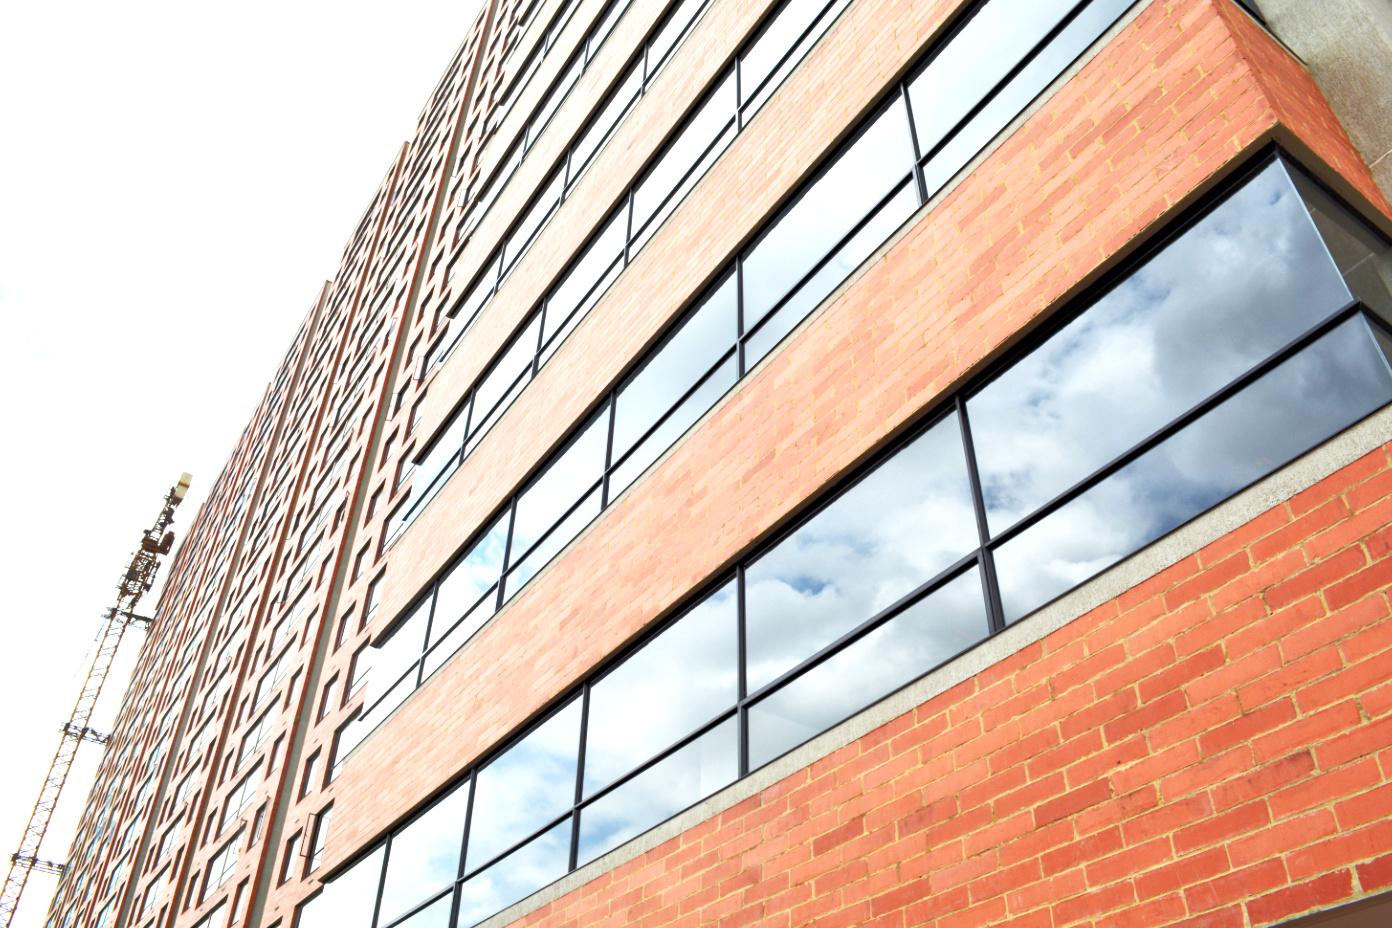 Fachada Club House - Torres de Timiza, apartamentos en venta, sector Kennedy, Bogotá, vivienda de interés social VIS, aplica subsidio